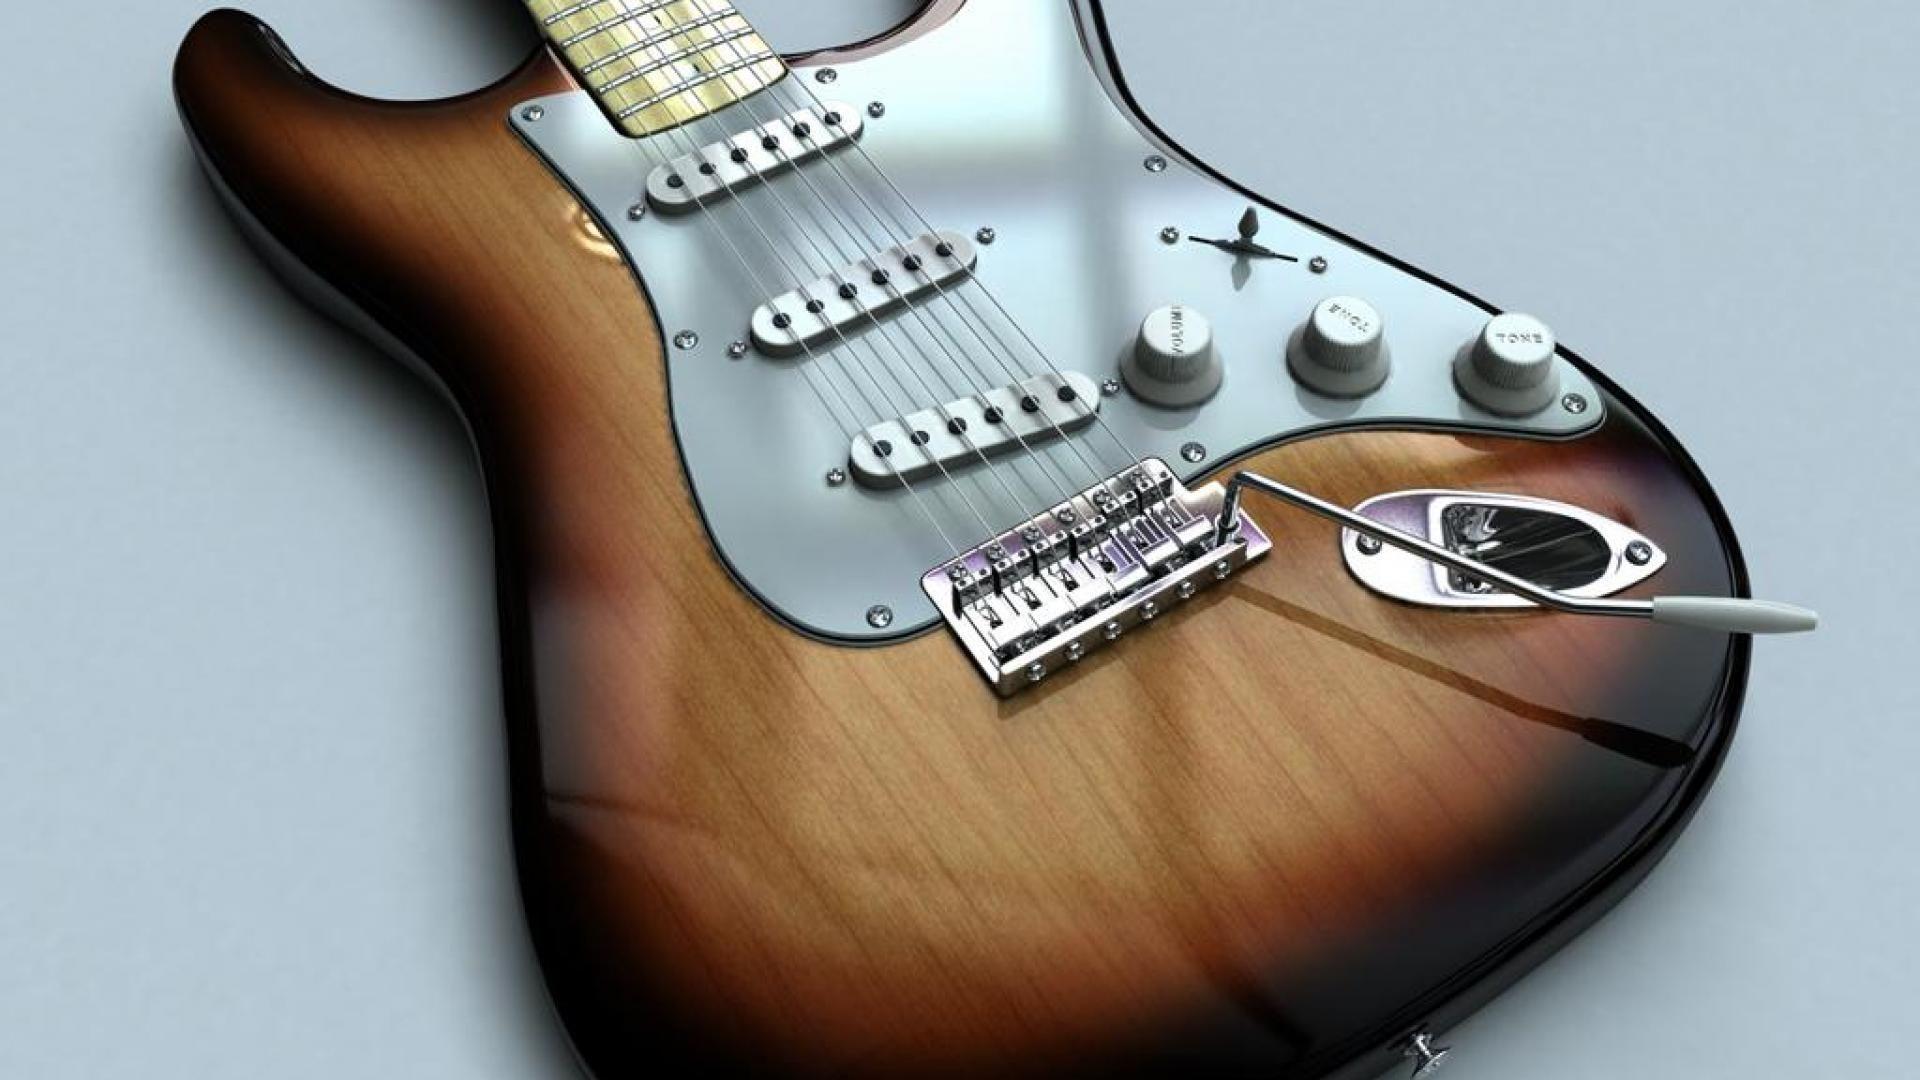 Fender Guitar, PC Wallpaper